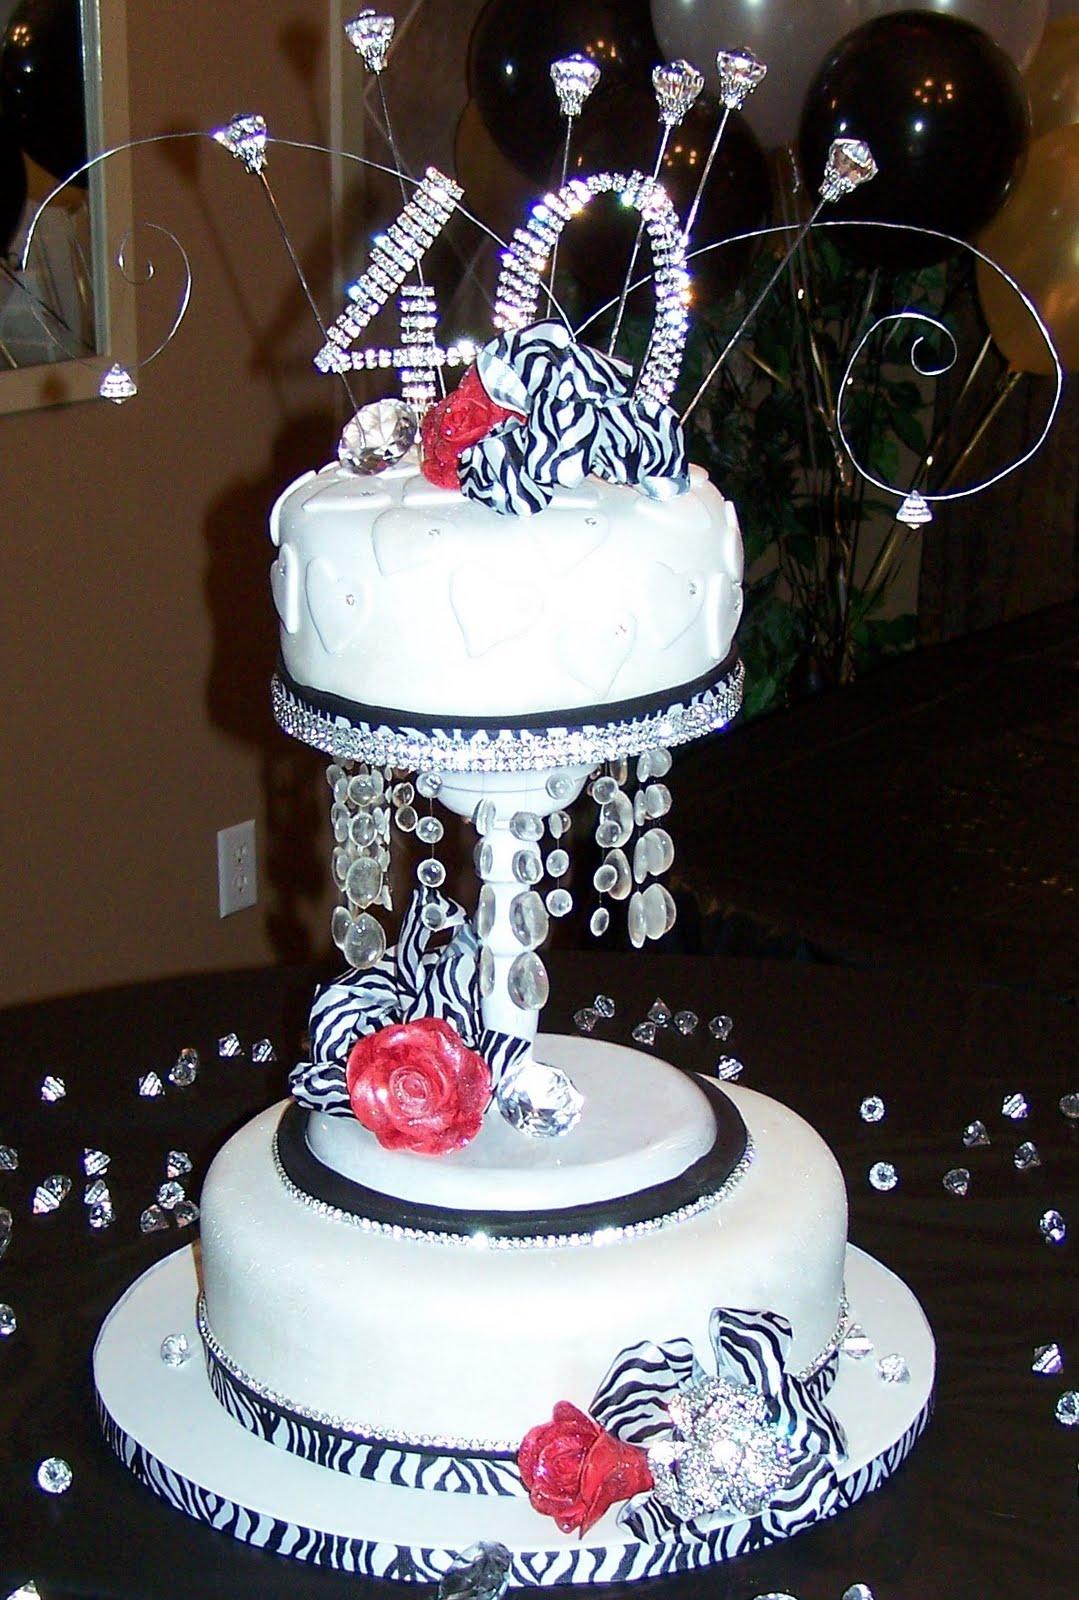 http://4.bp.blogspot.com/-TRsvsiy_TKY/Th0C8JX567I/AAAAAAAAAtk/LuIPlYWSCdY/s1600/bling%2Bcake.jpg